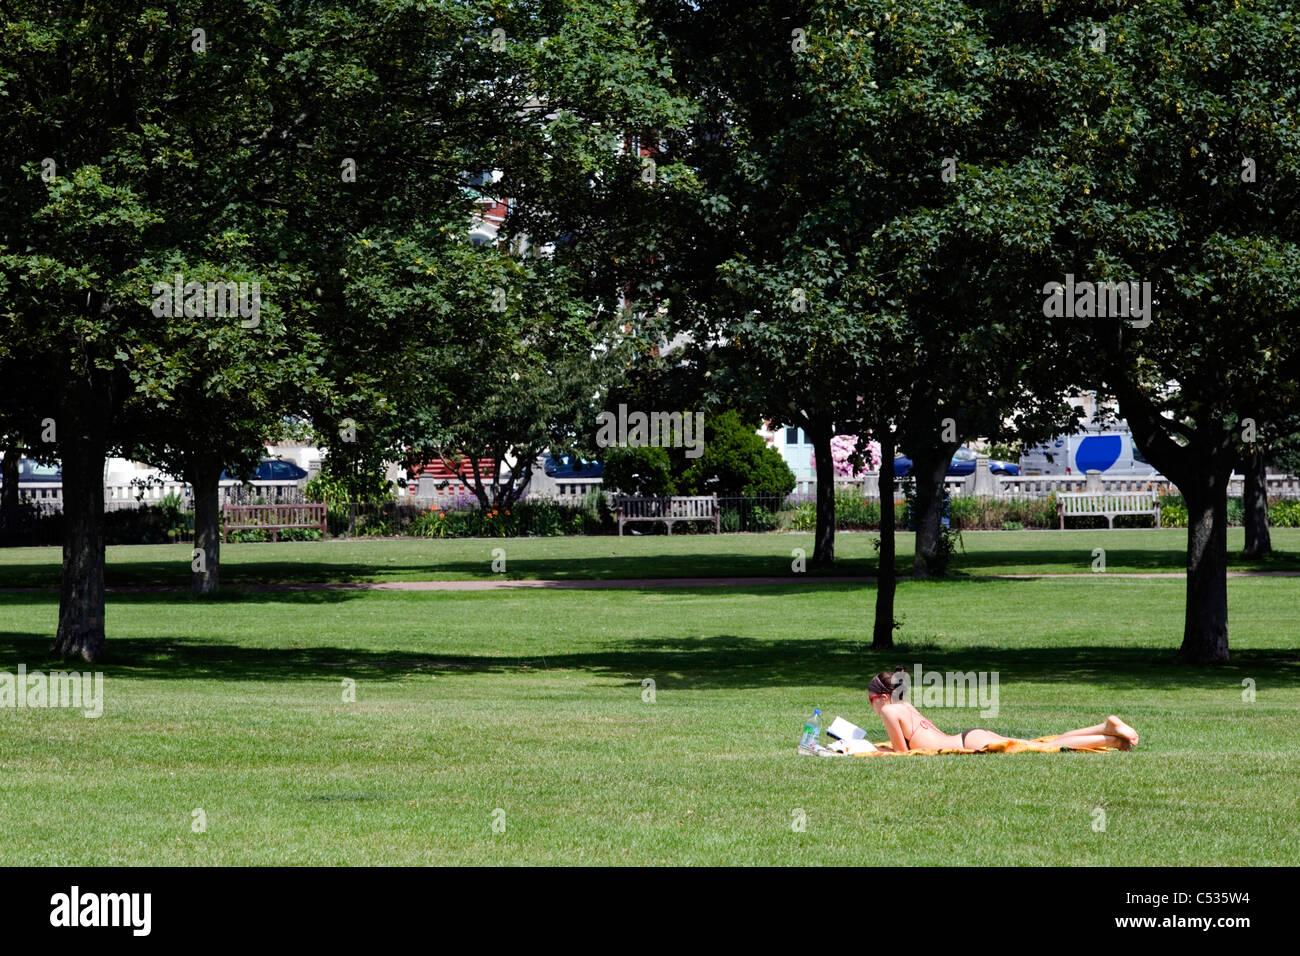 Mature woman sunbathing in public park